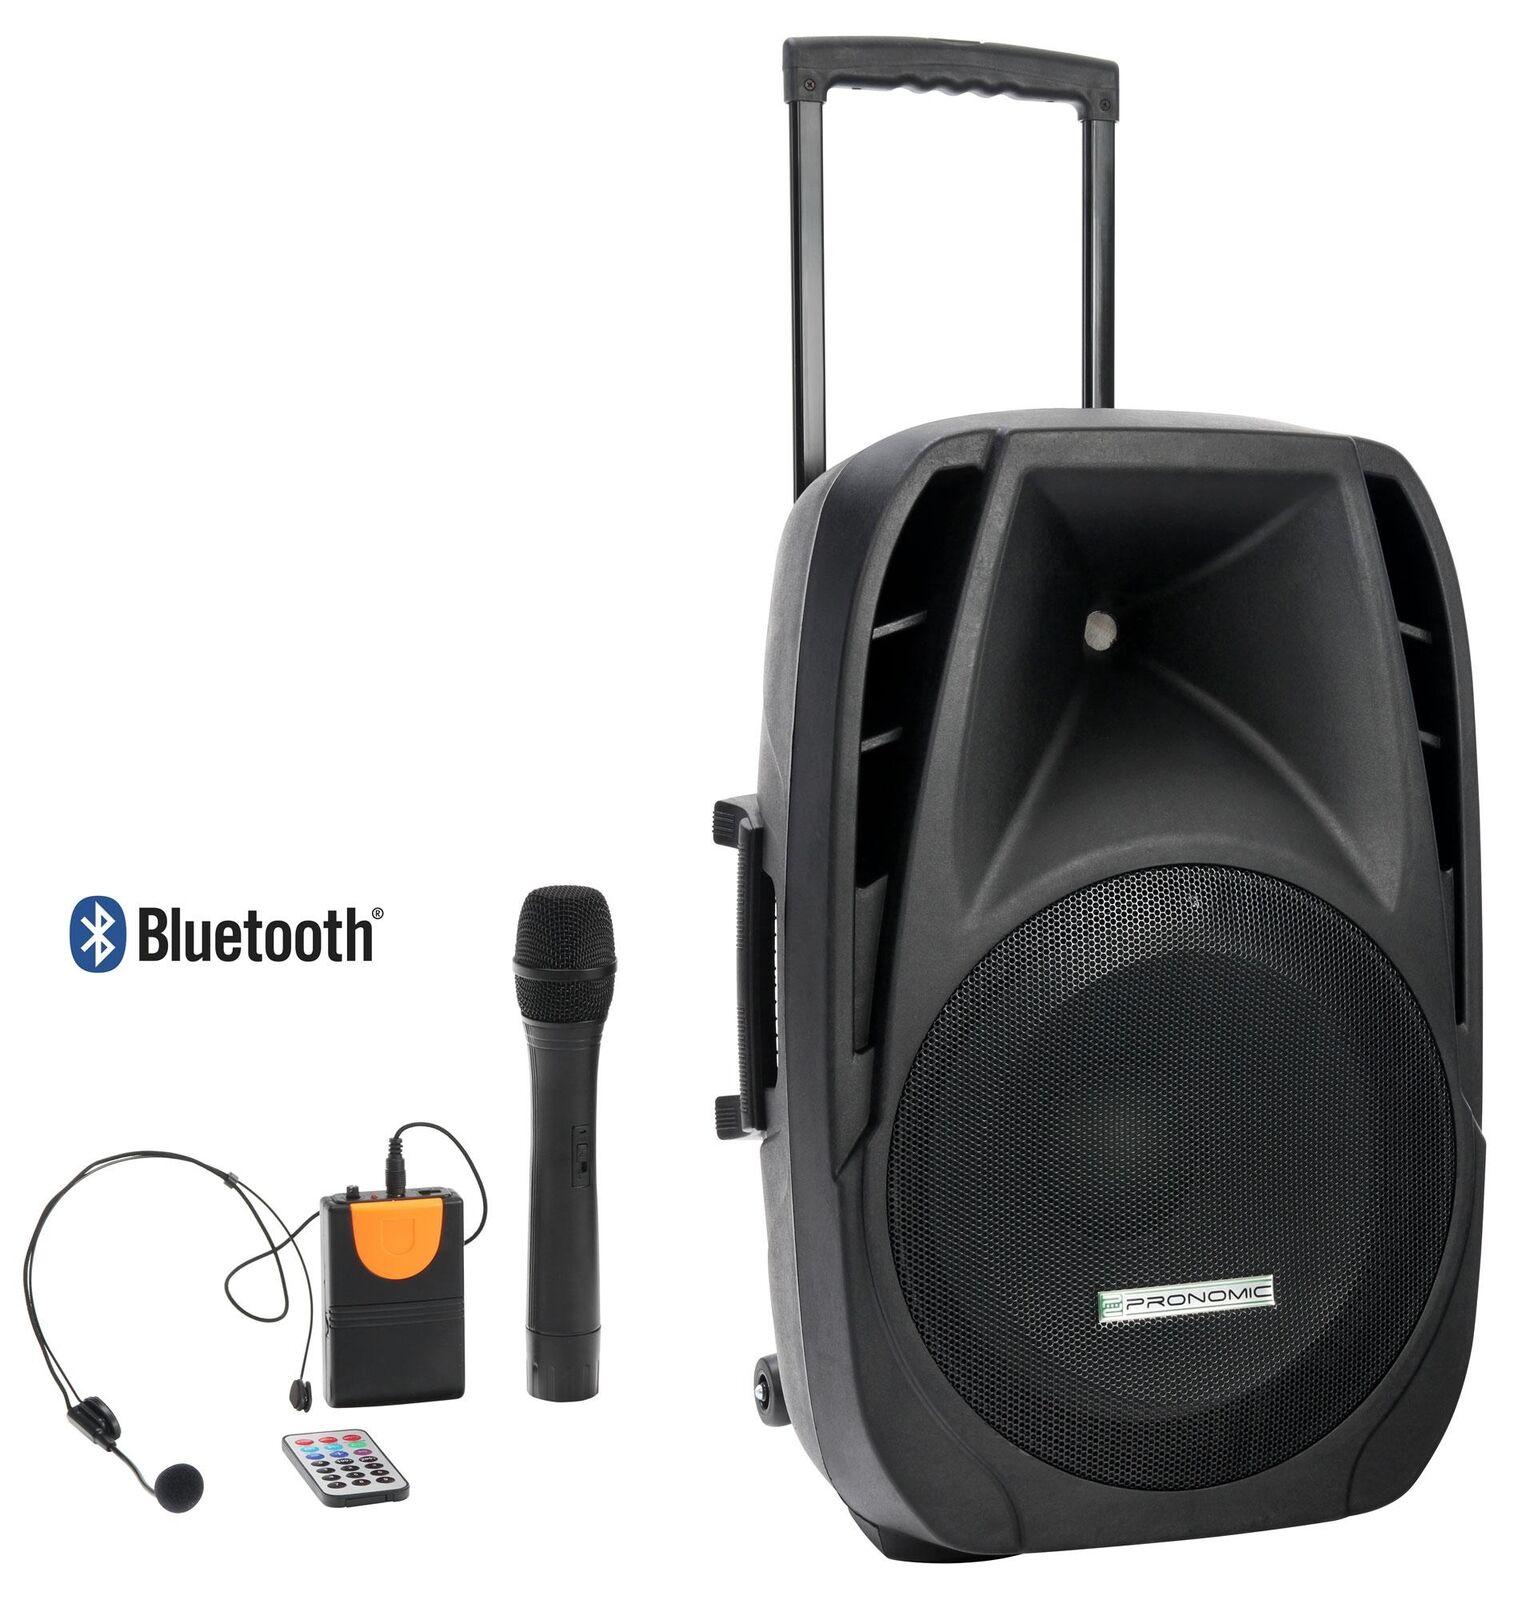 Mobile DJ PA karaoke fiesta Sound apéndice box box box azultooth mp3 USB SD 200w micro  ventas en linea